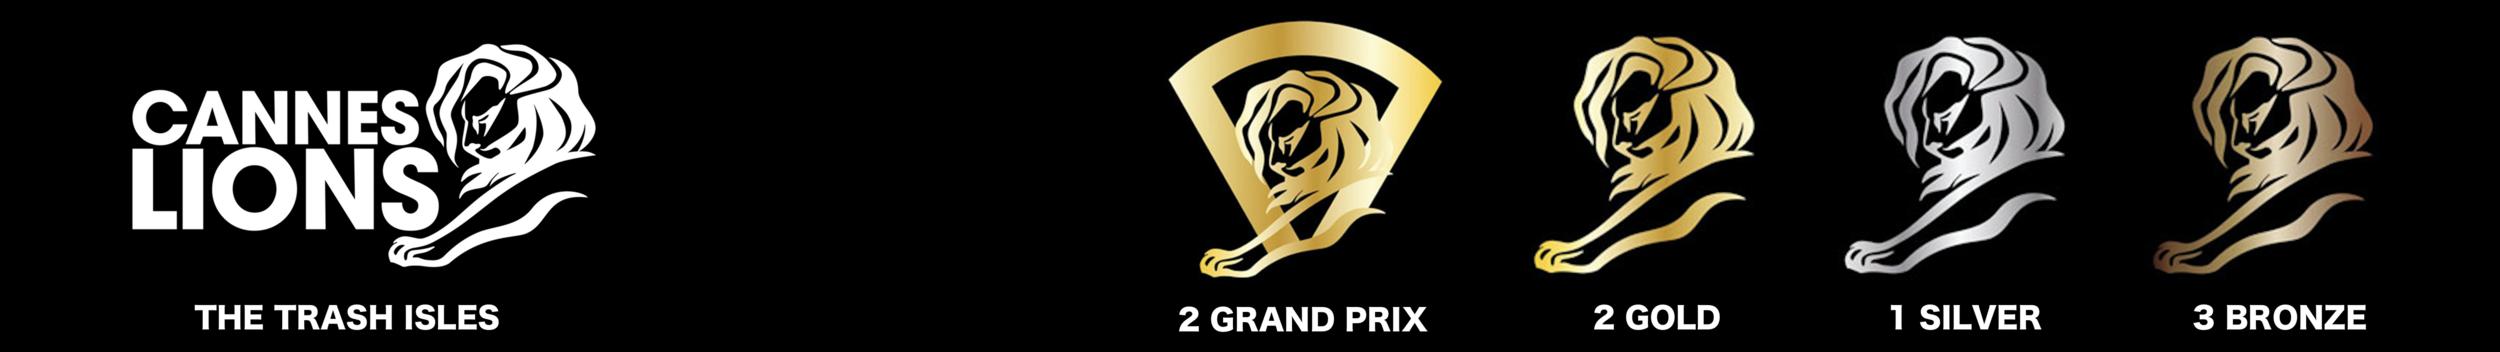 James Radford Music Cannes Lions Grand Prix